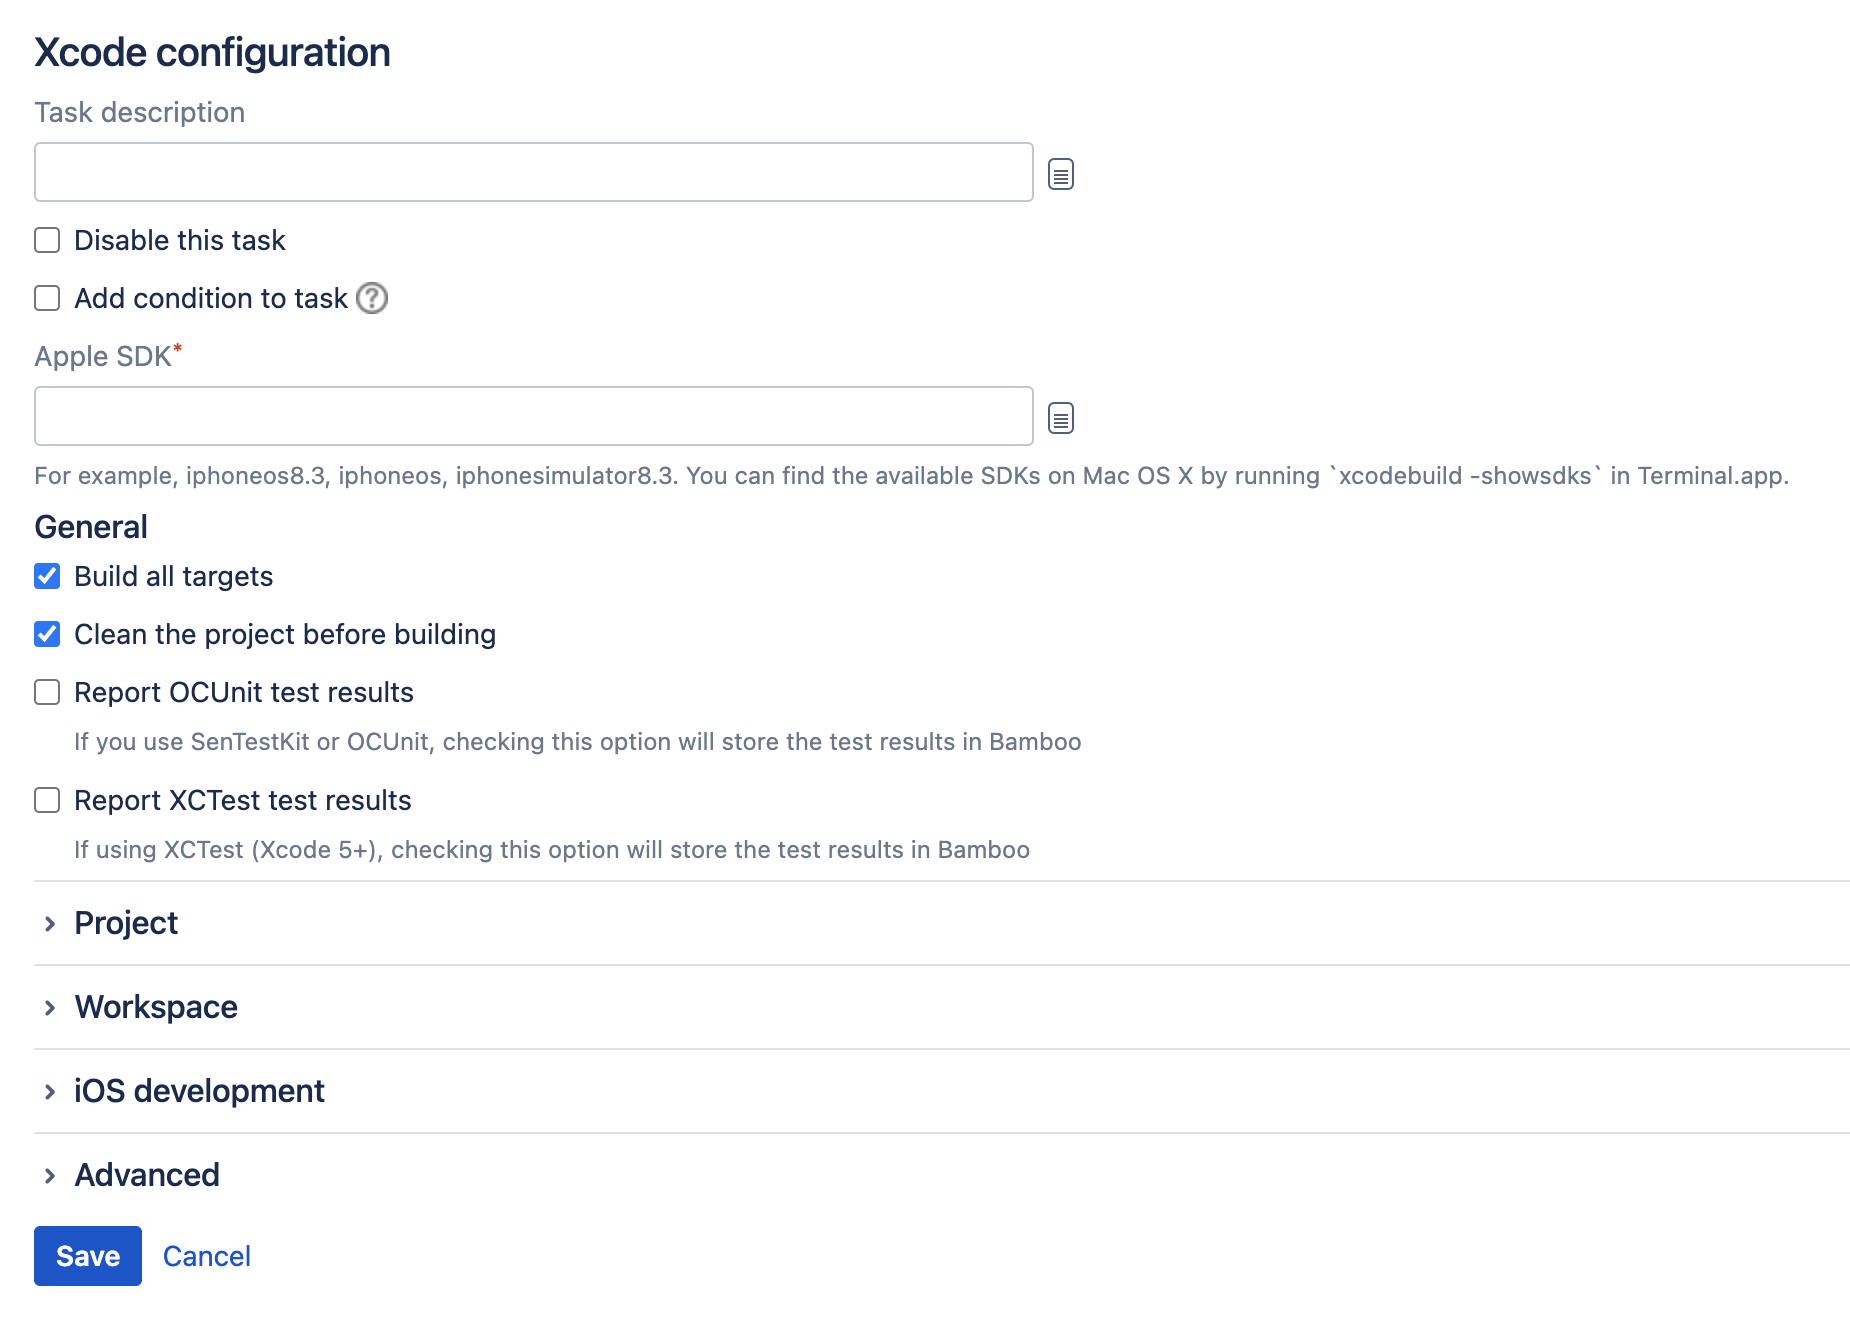 Xcode task type configuration screen